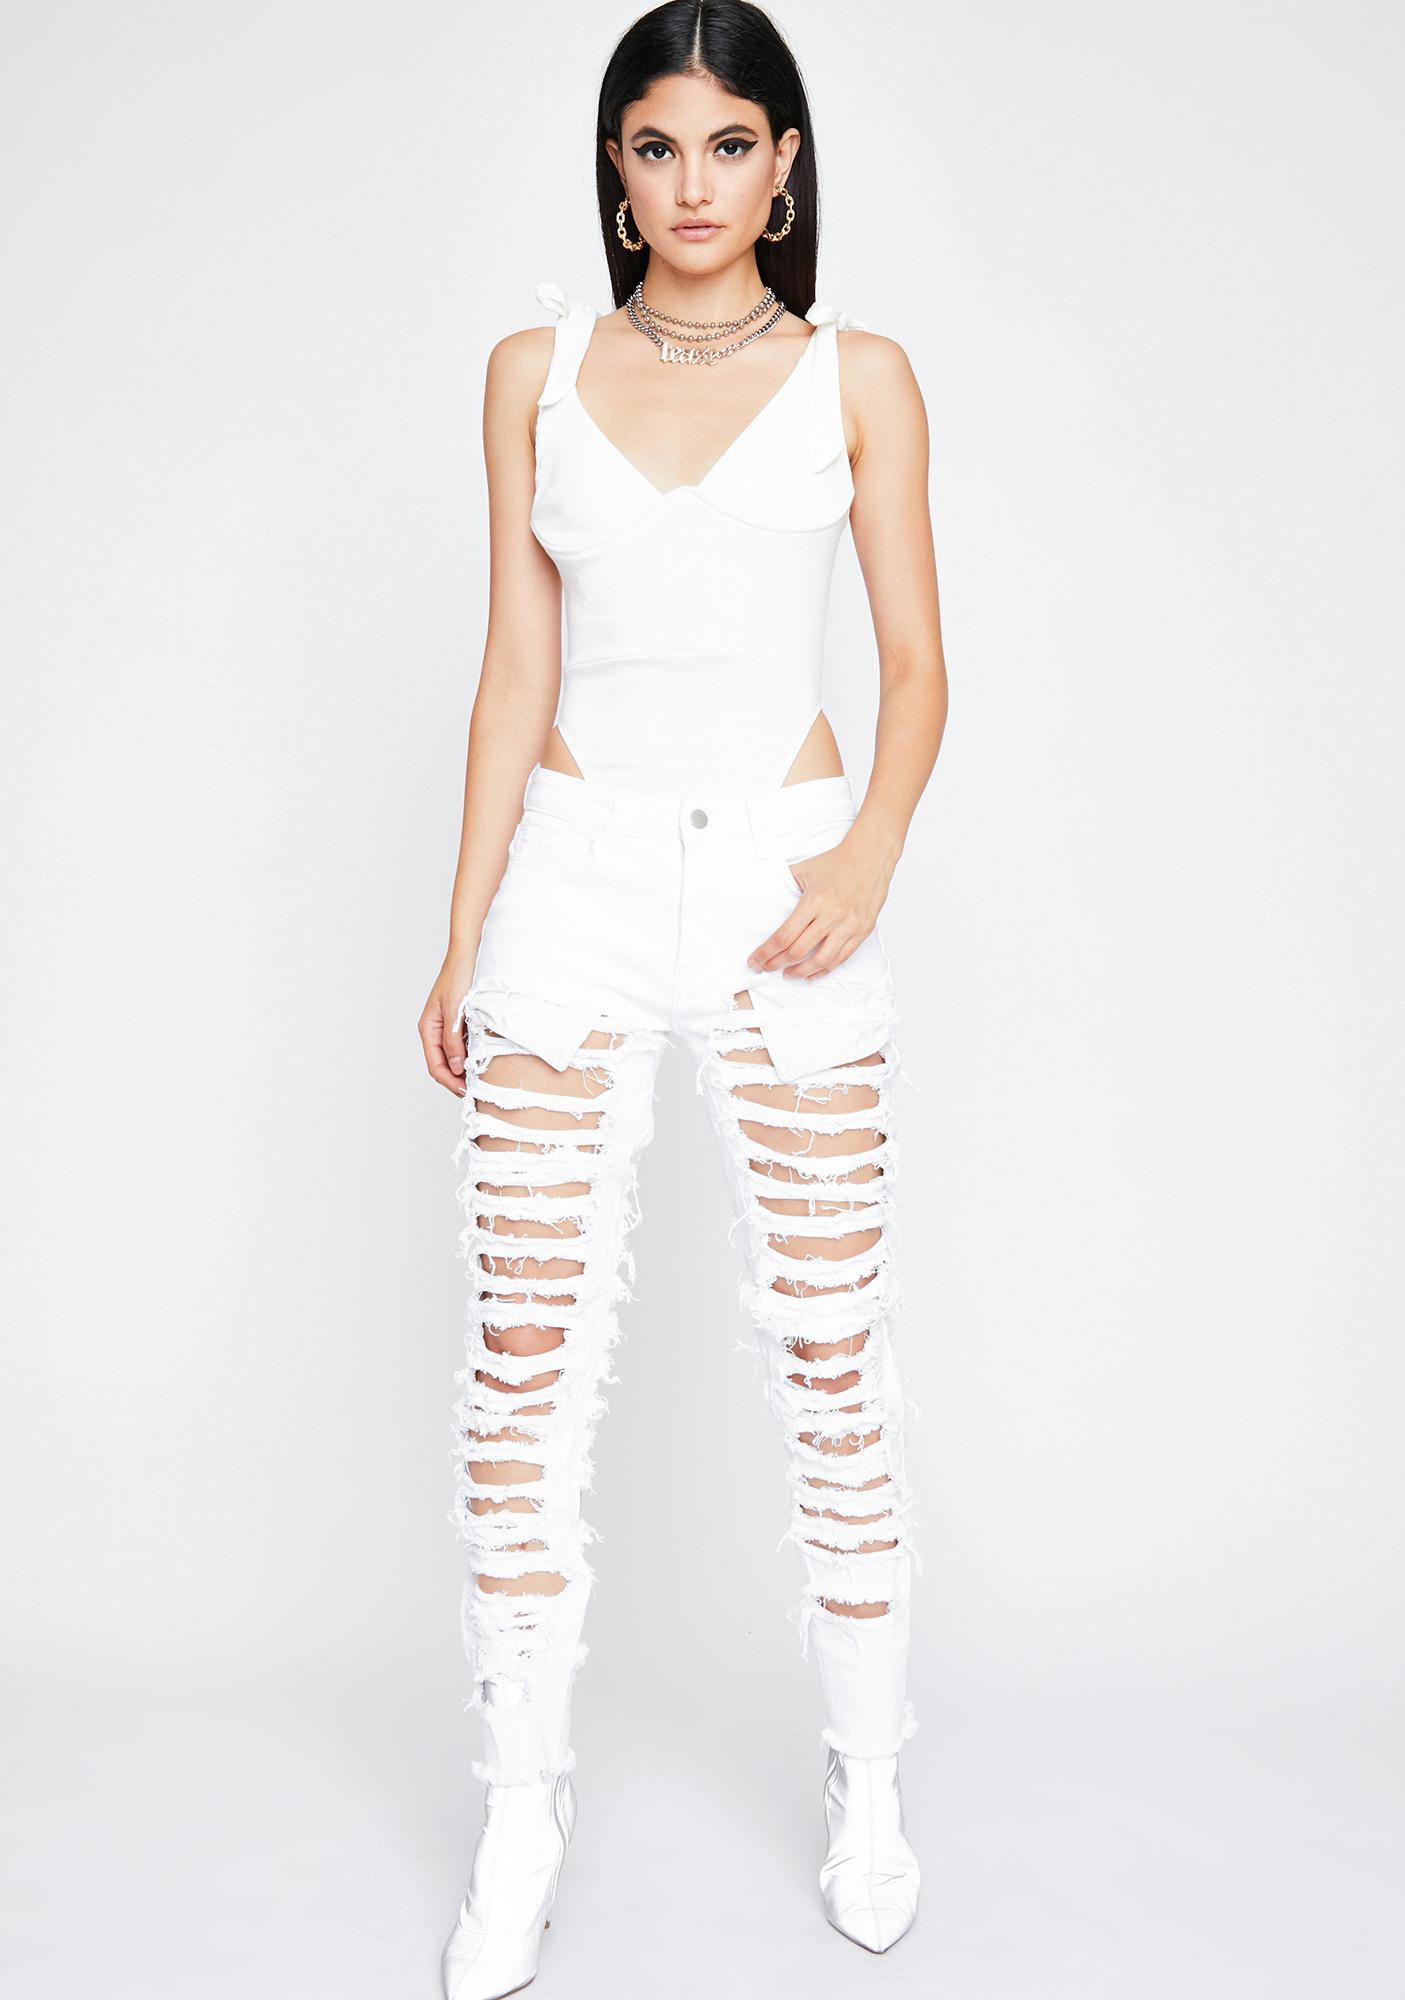 Frosted Honey Bun Knit Bodysuit